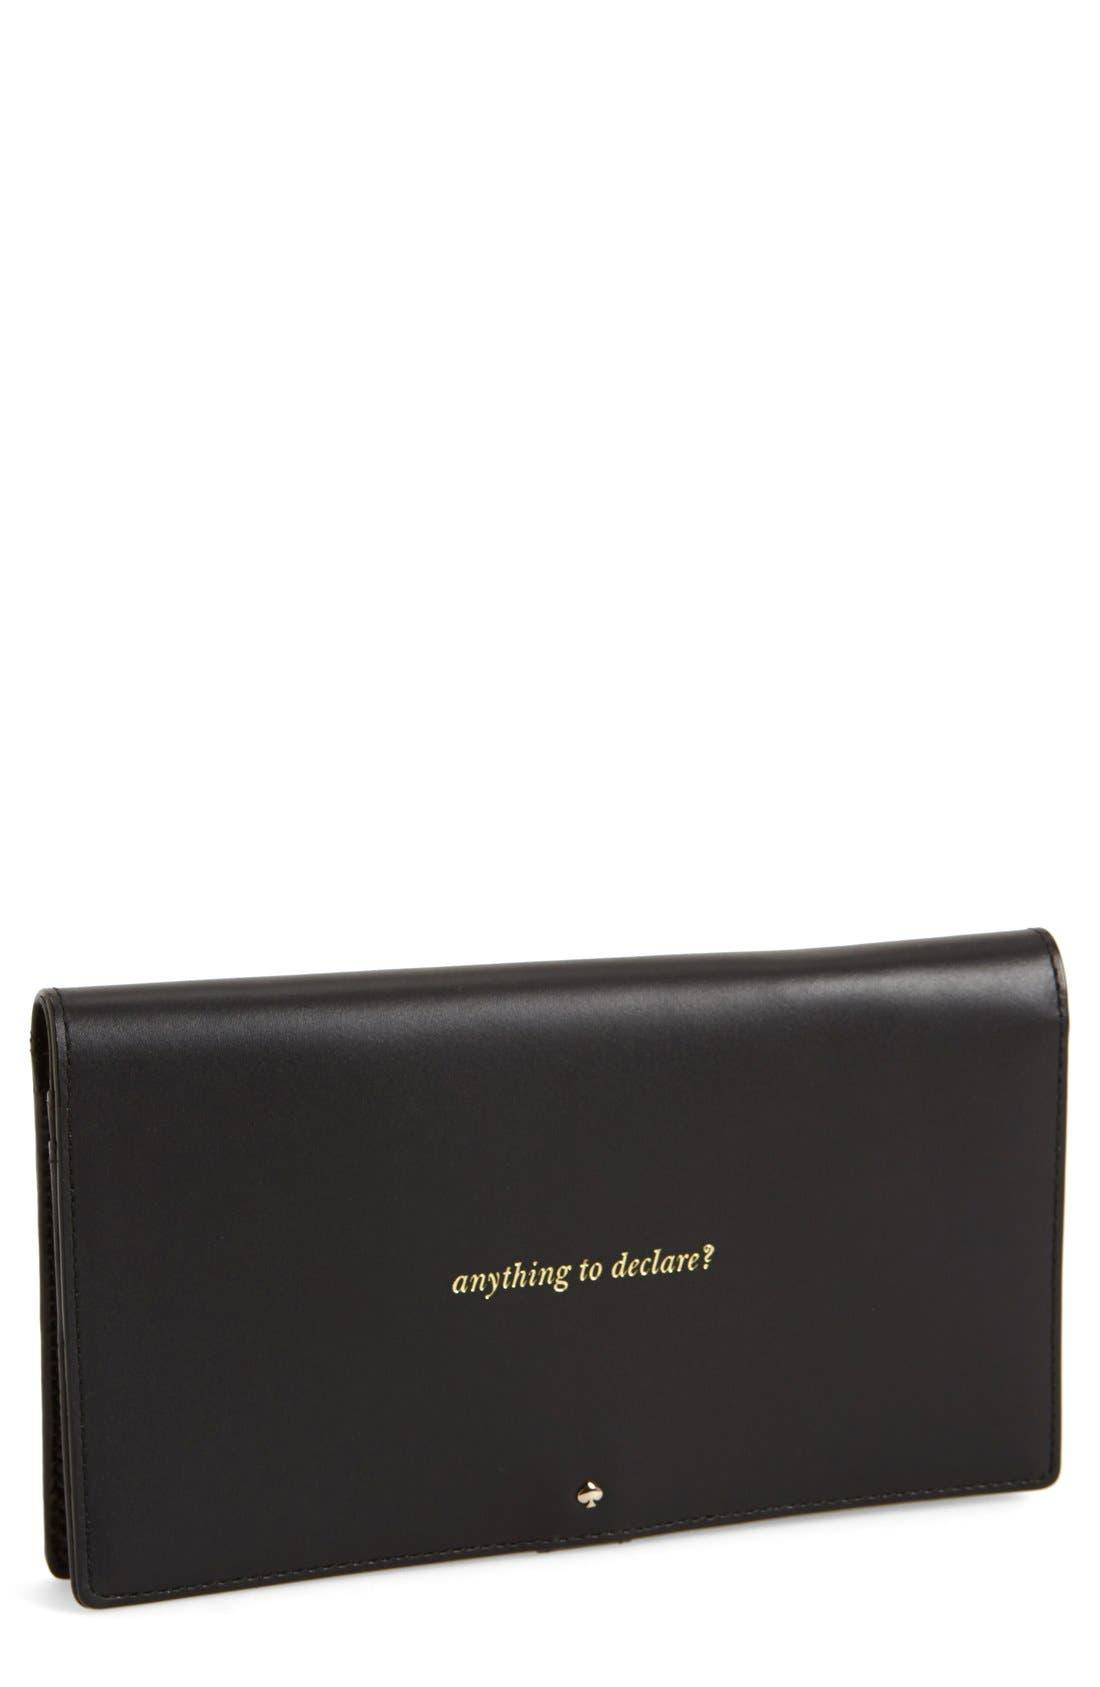 KATE SPADE NEW YORK 'bon voyage' travel wallet, Main, color, 001